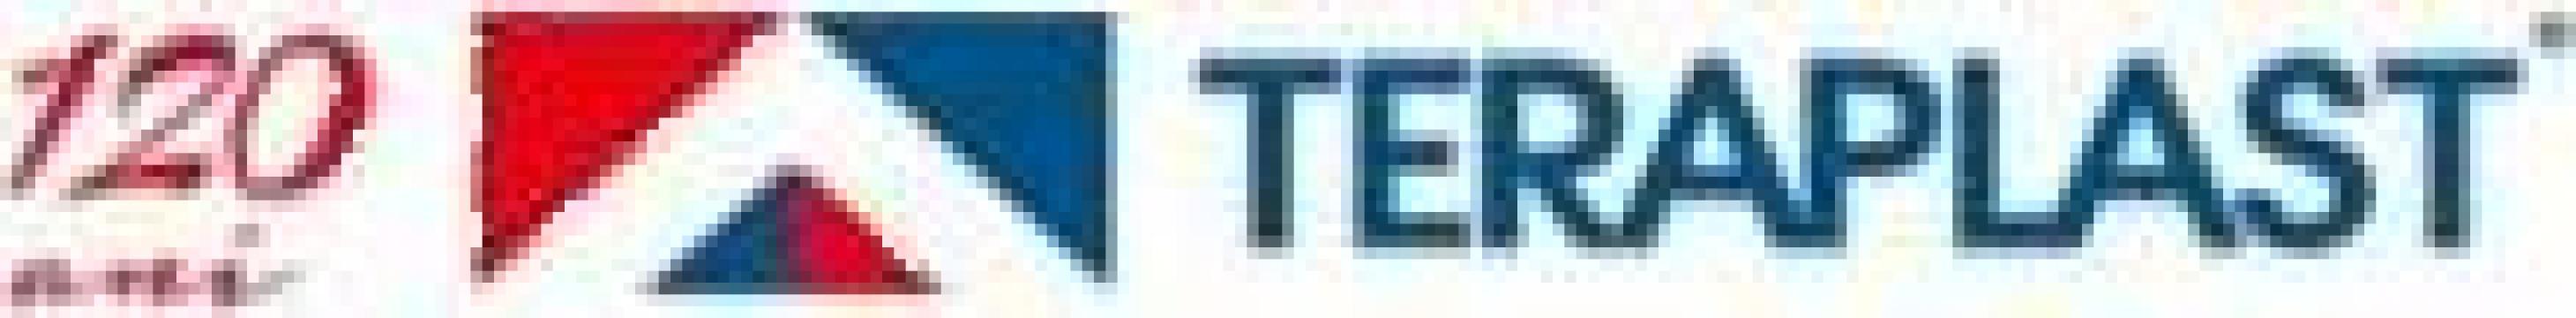 Profile geam termopan Teraplast de la Glassoterm Total Srl